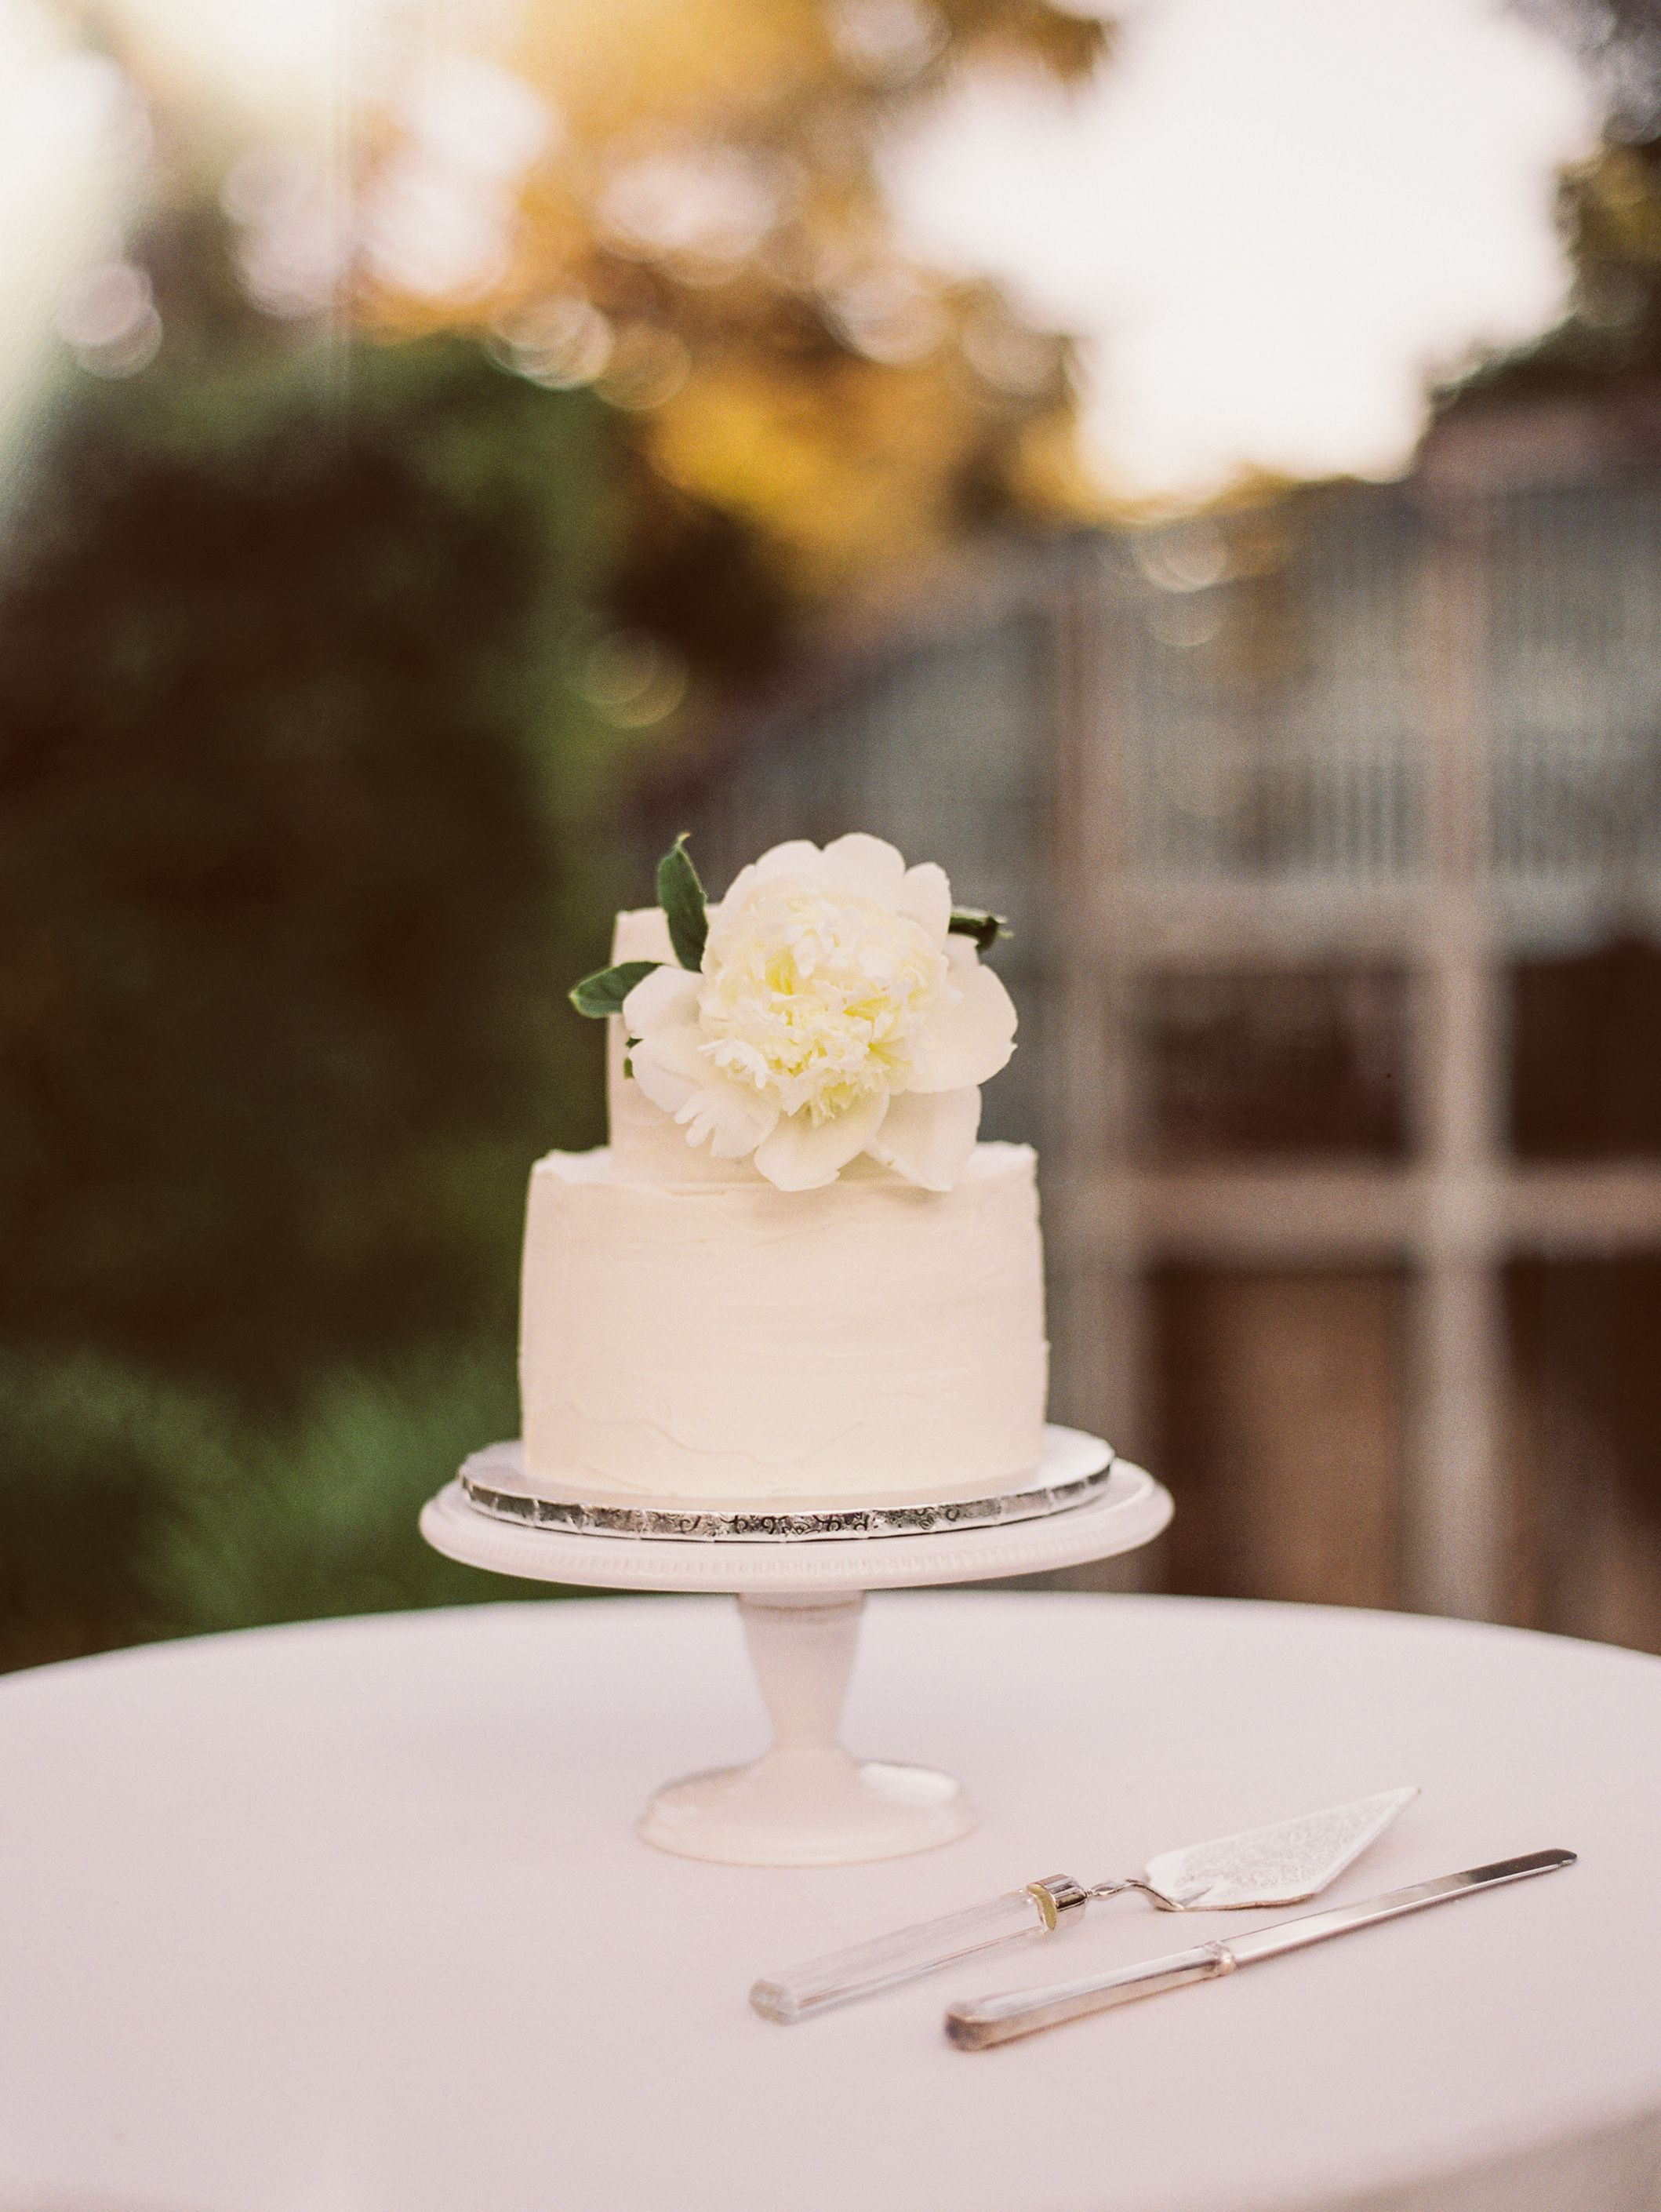 Beautiful cake made by Lori in Santa Barbara only 200